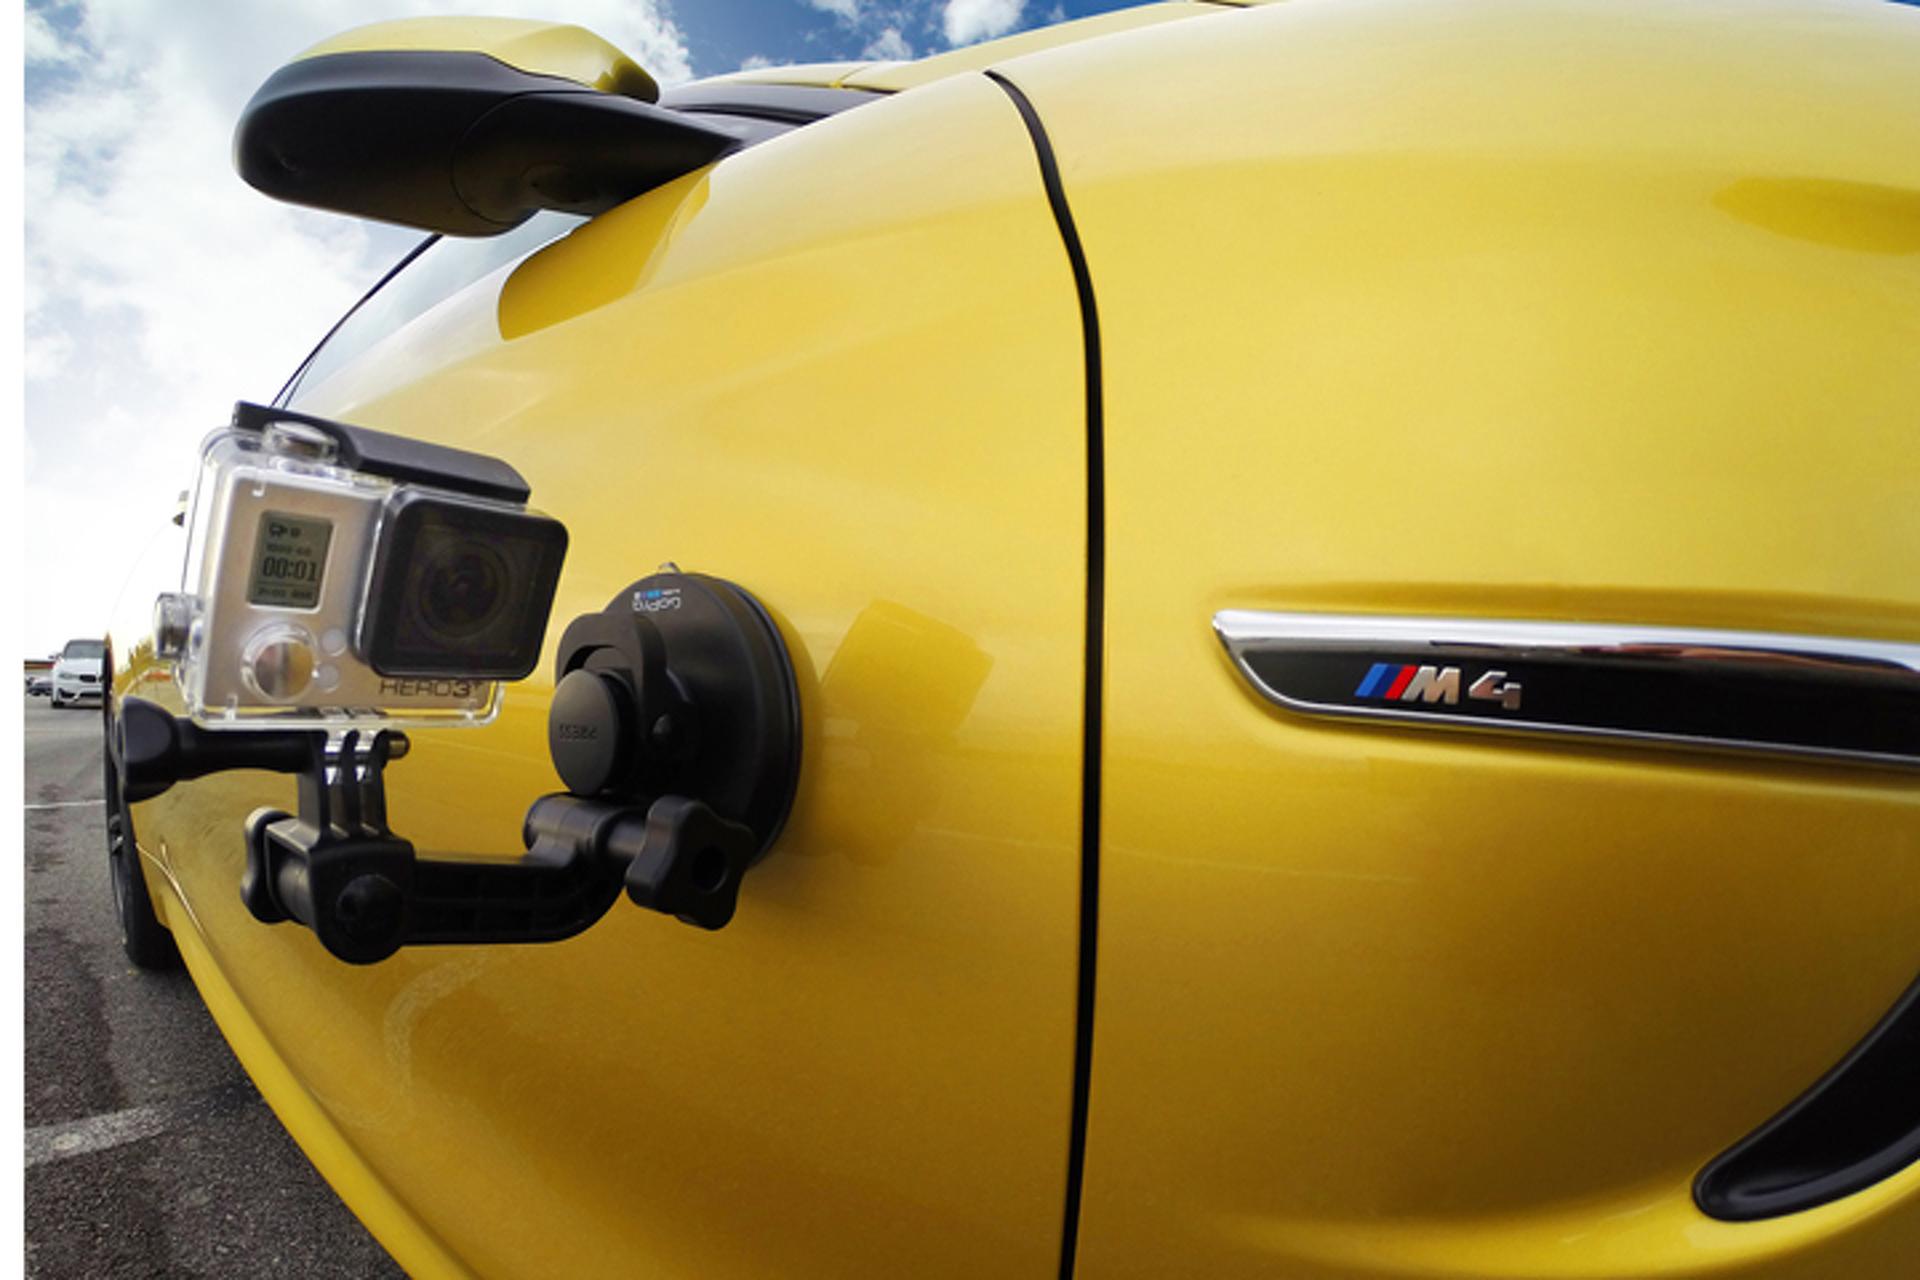 BMW, MINI Adding GoPro Connectivity to Cabin Tech